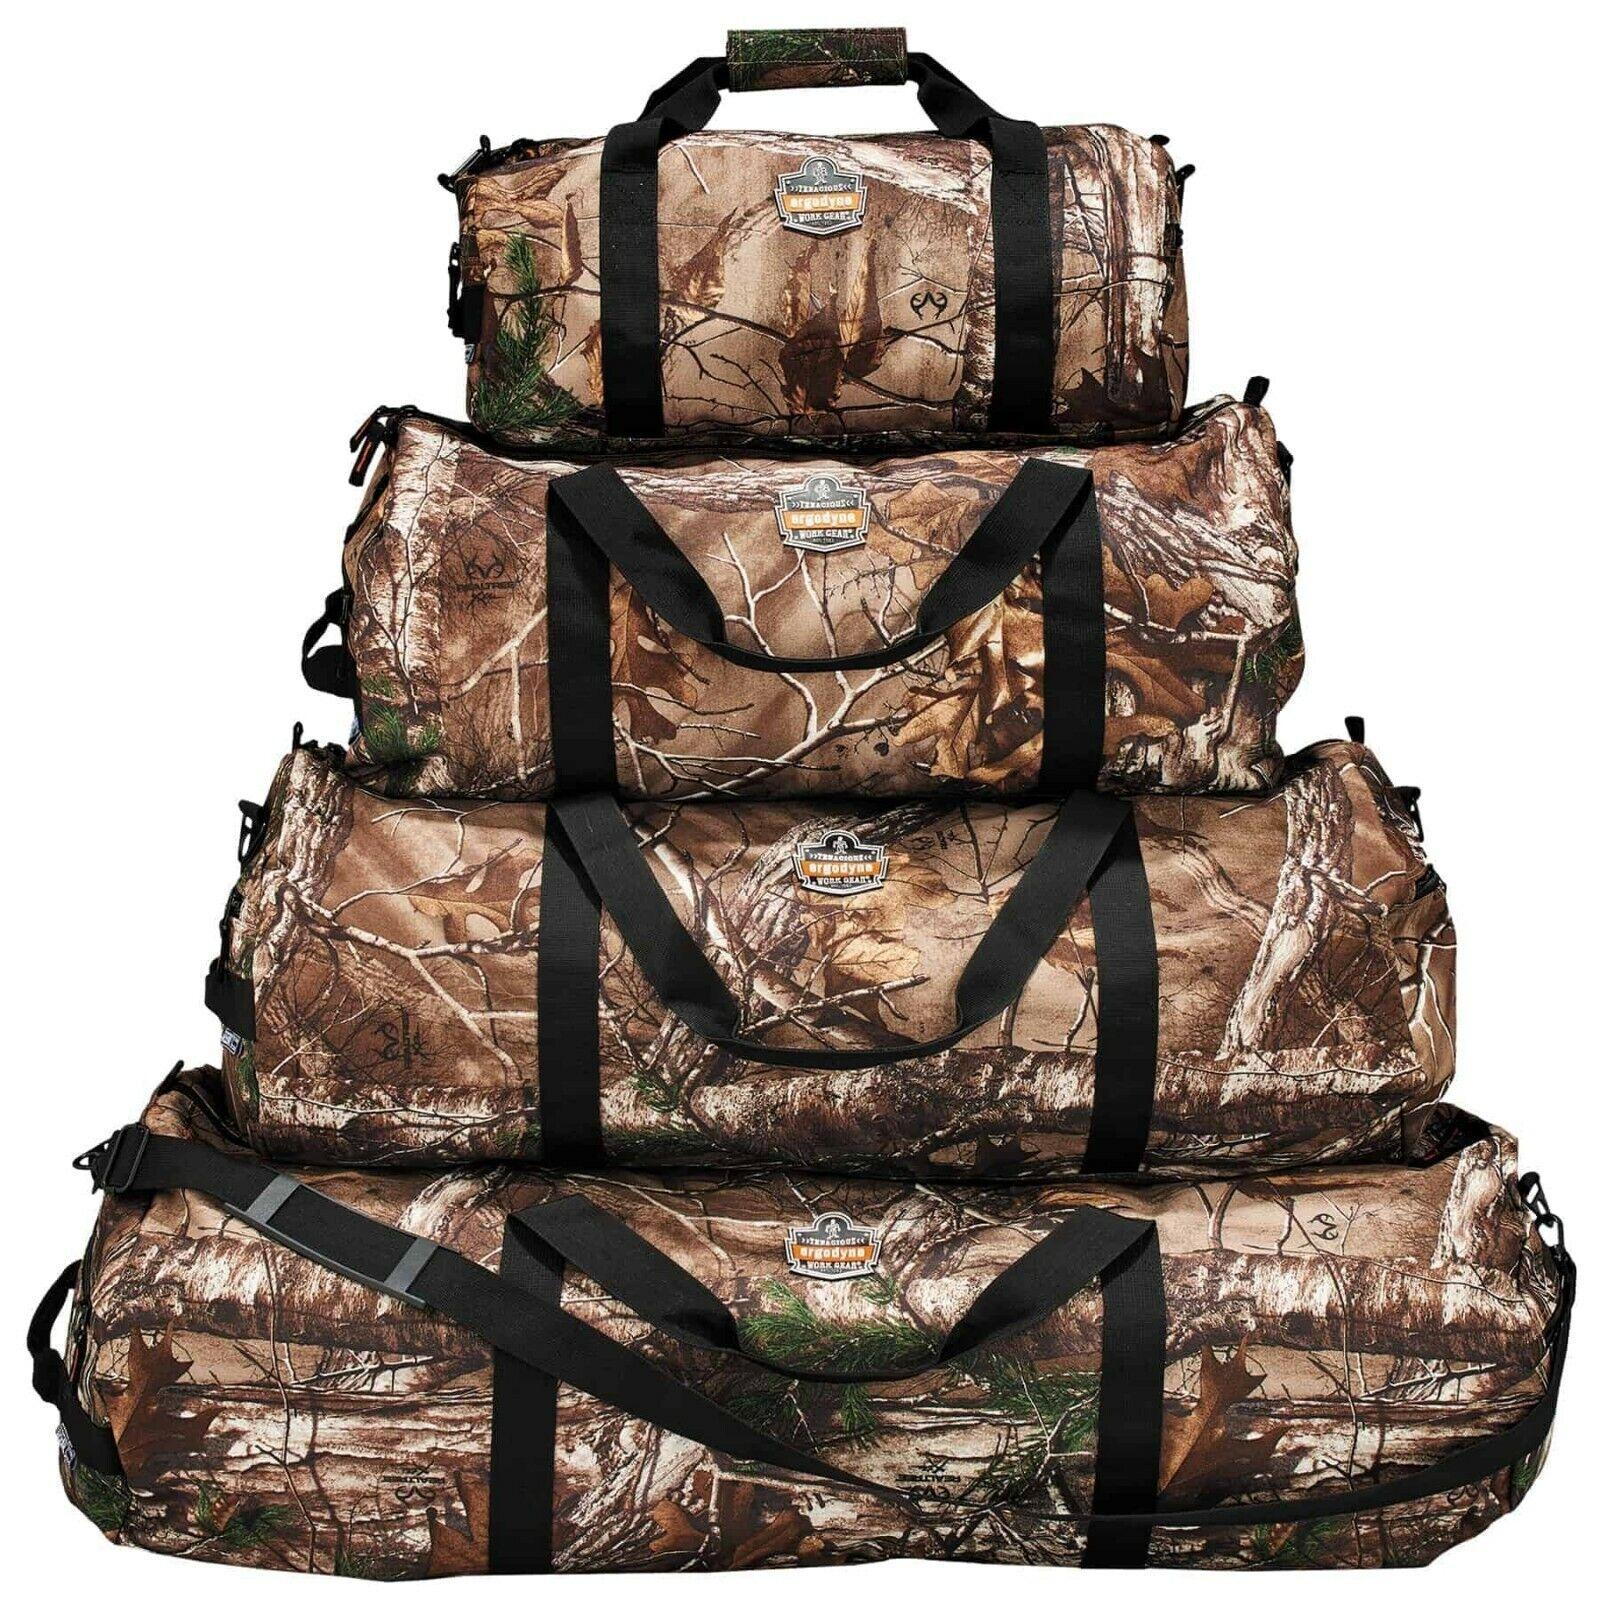 Ergodyne Arsenal 5020 Realtree Xtra Standard Gear Duffel Bag, LG, NEW, Free Ship